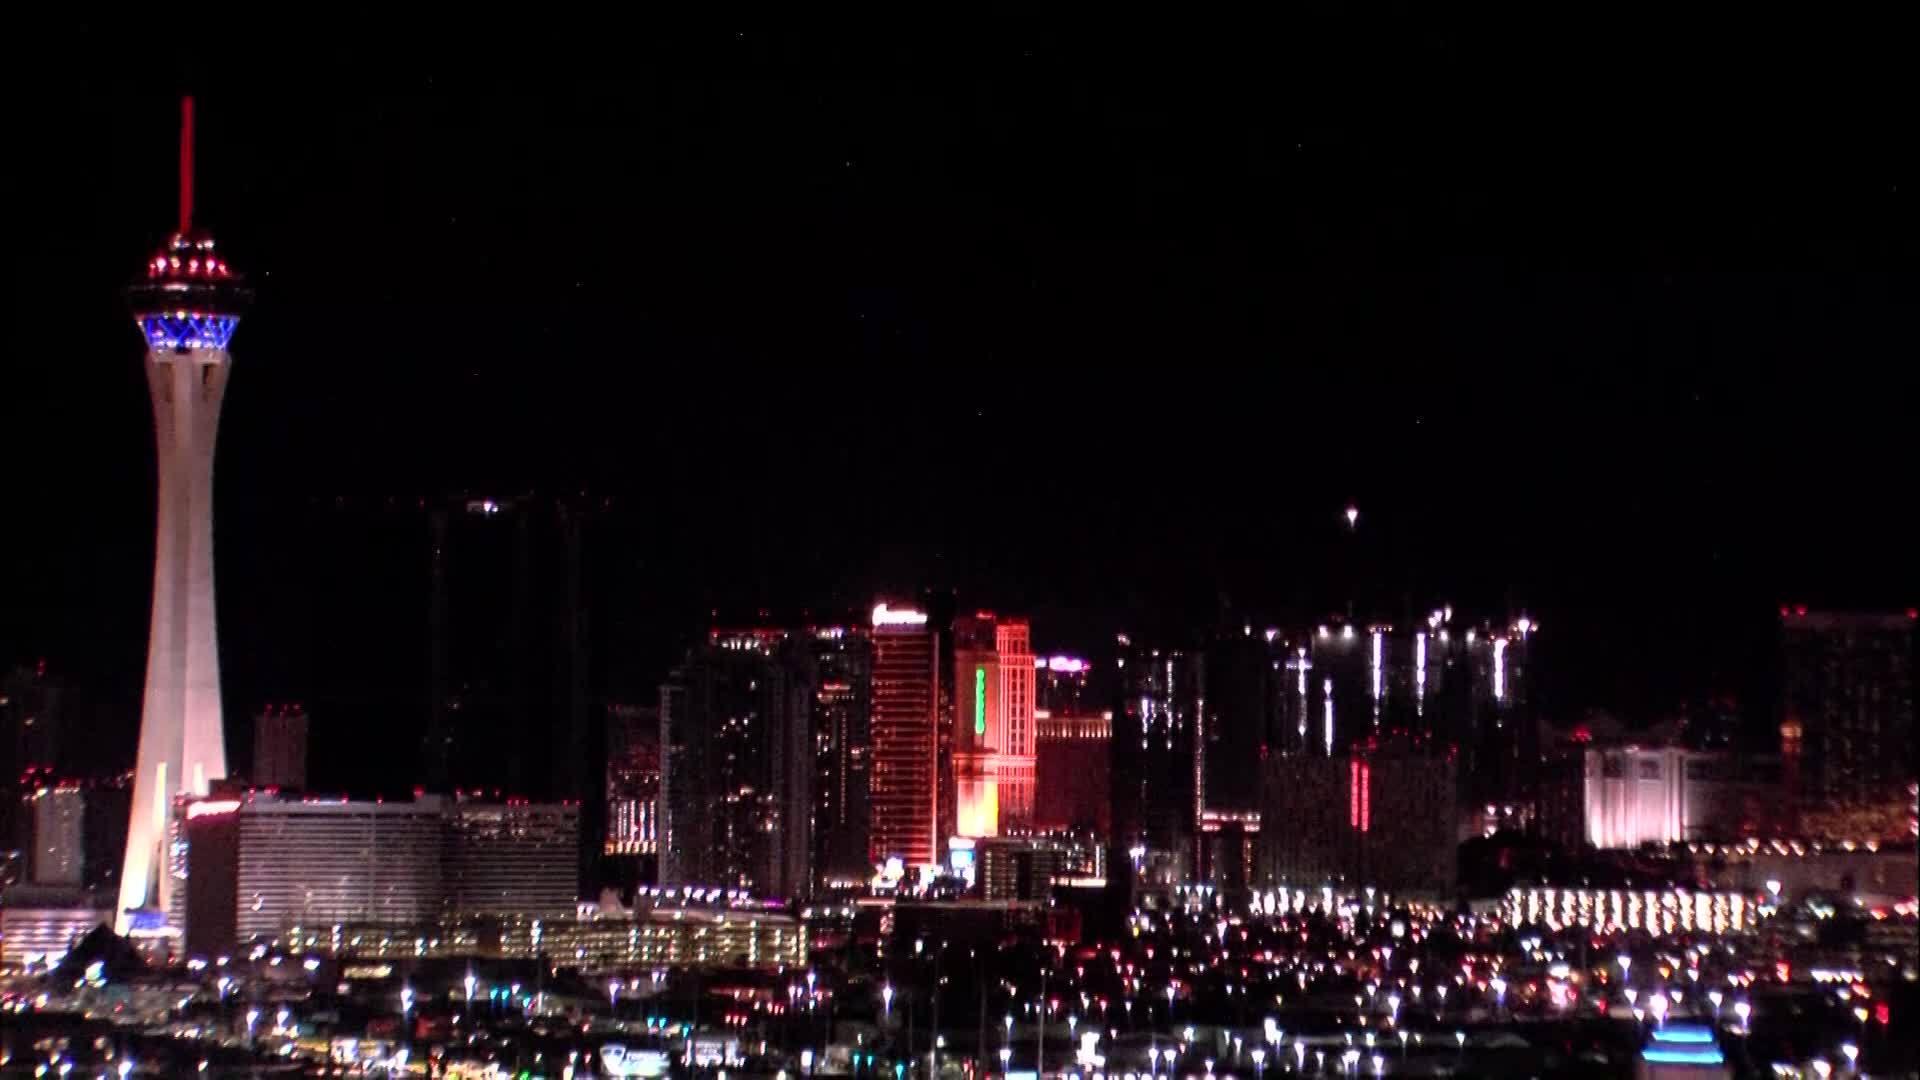 Las_Vegas_Strip_goes_dark_to_commemorate_0_20190331035932